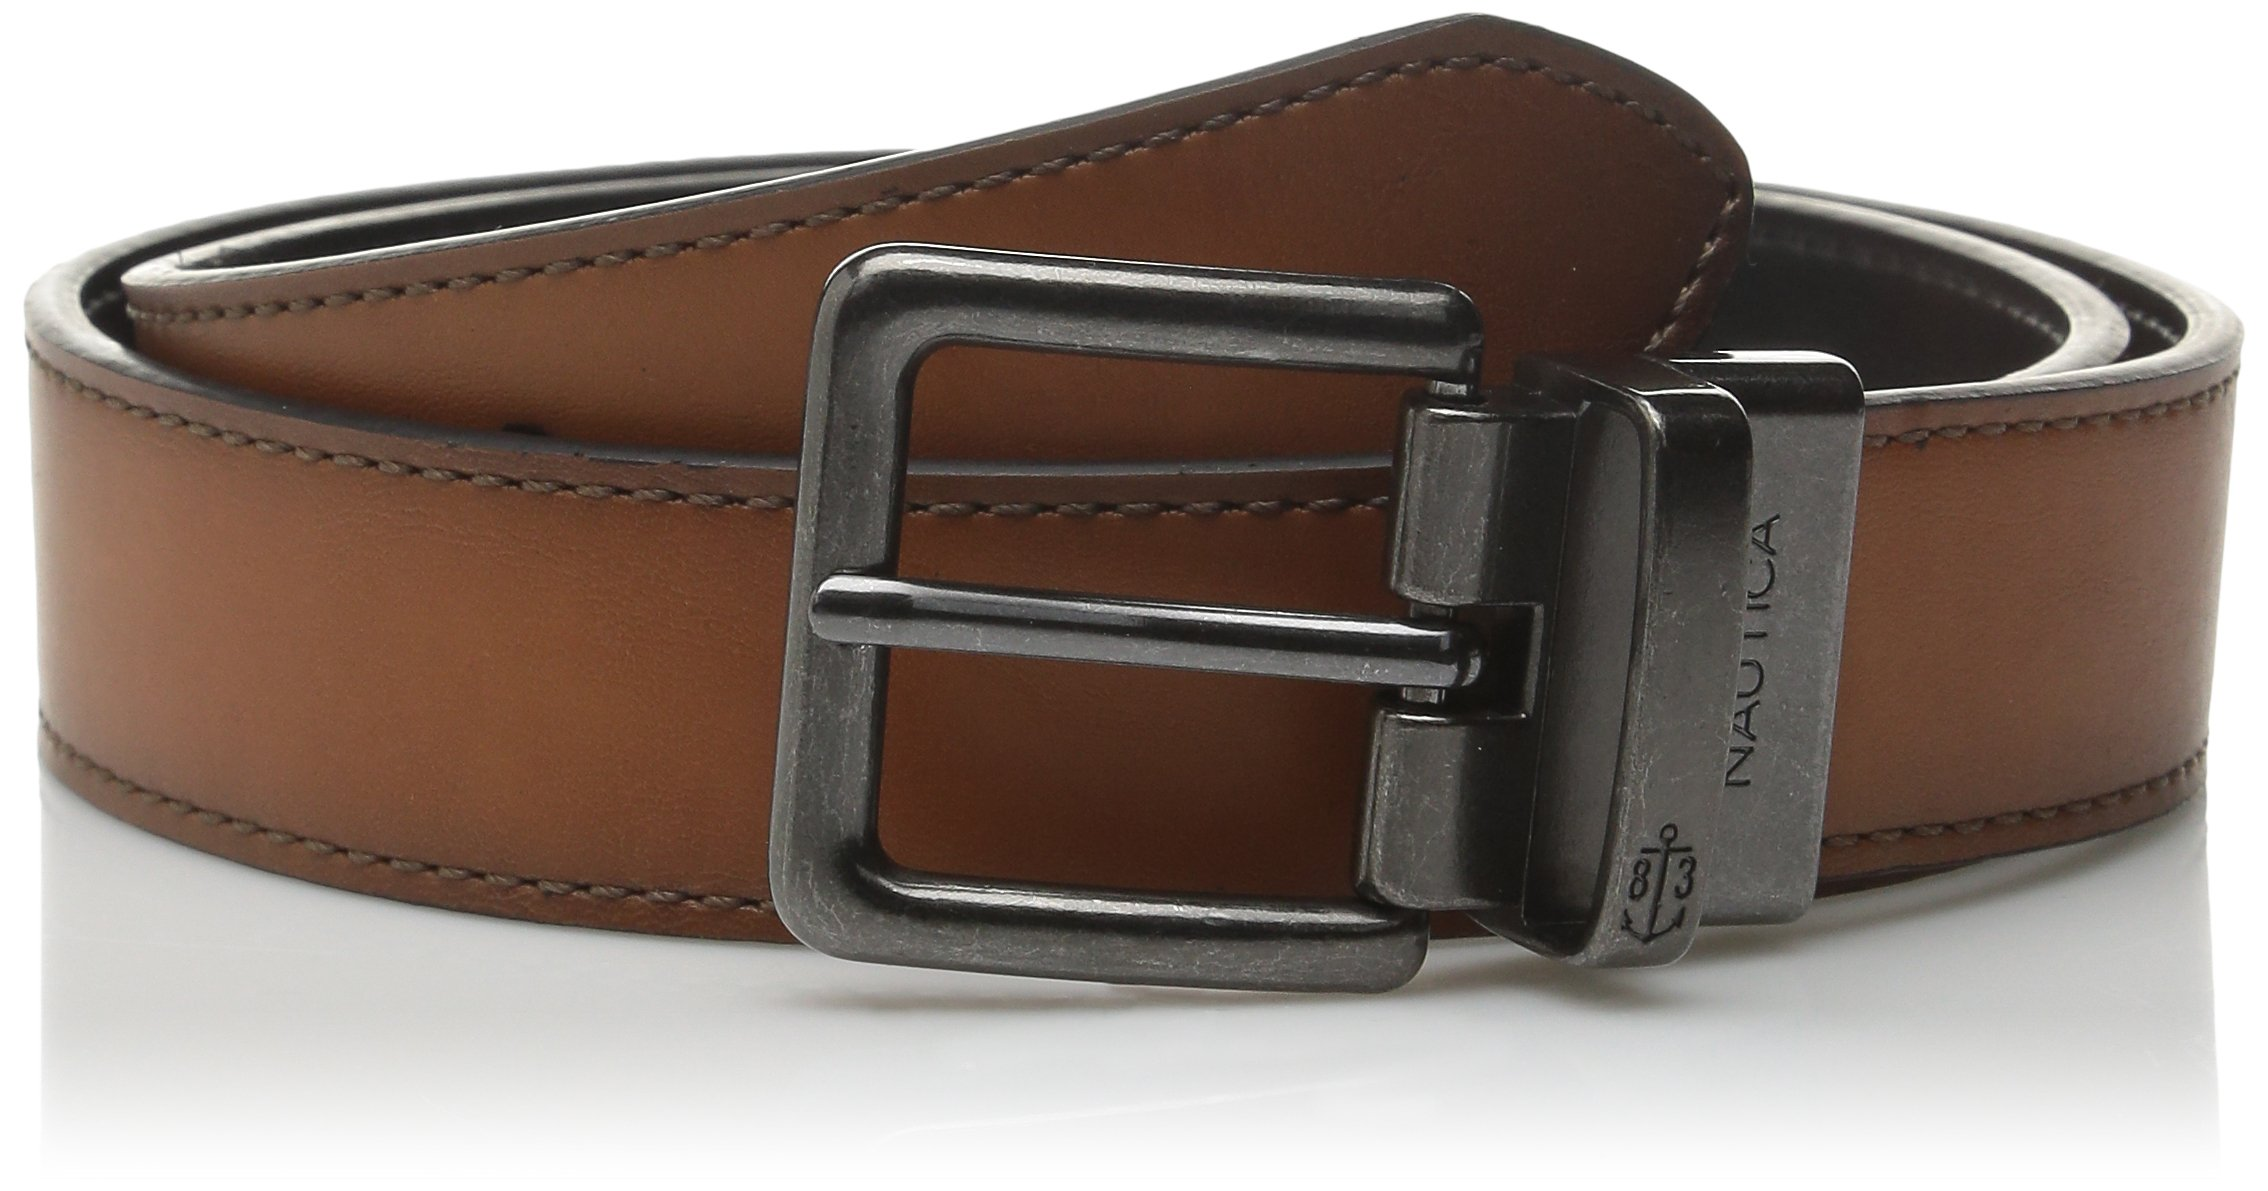 Nautica Men's Battan Reversible Belt,Tan/Black,22